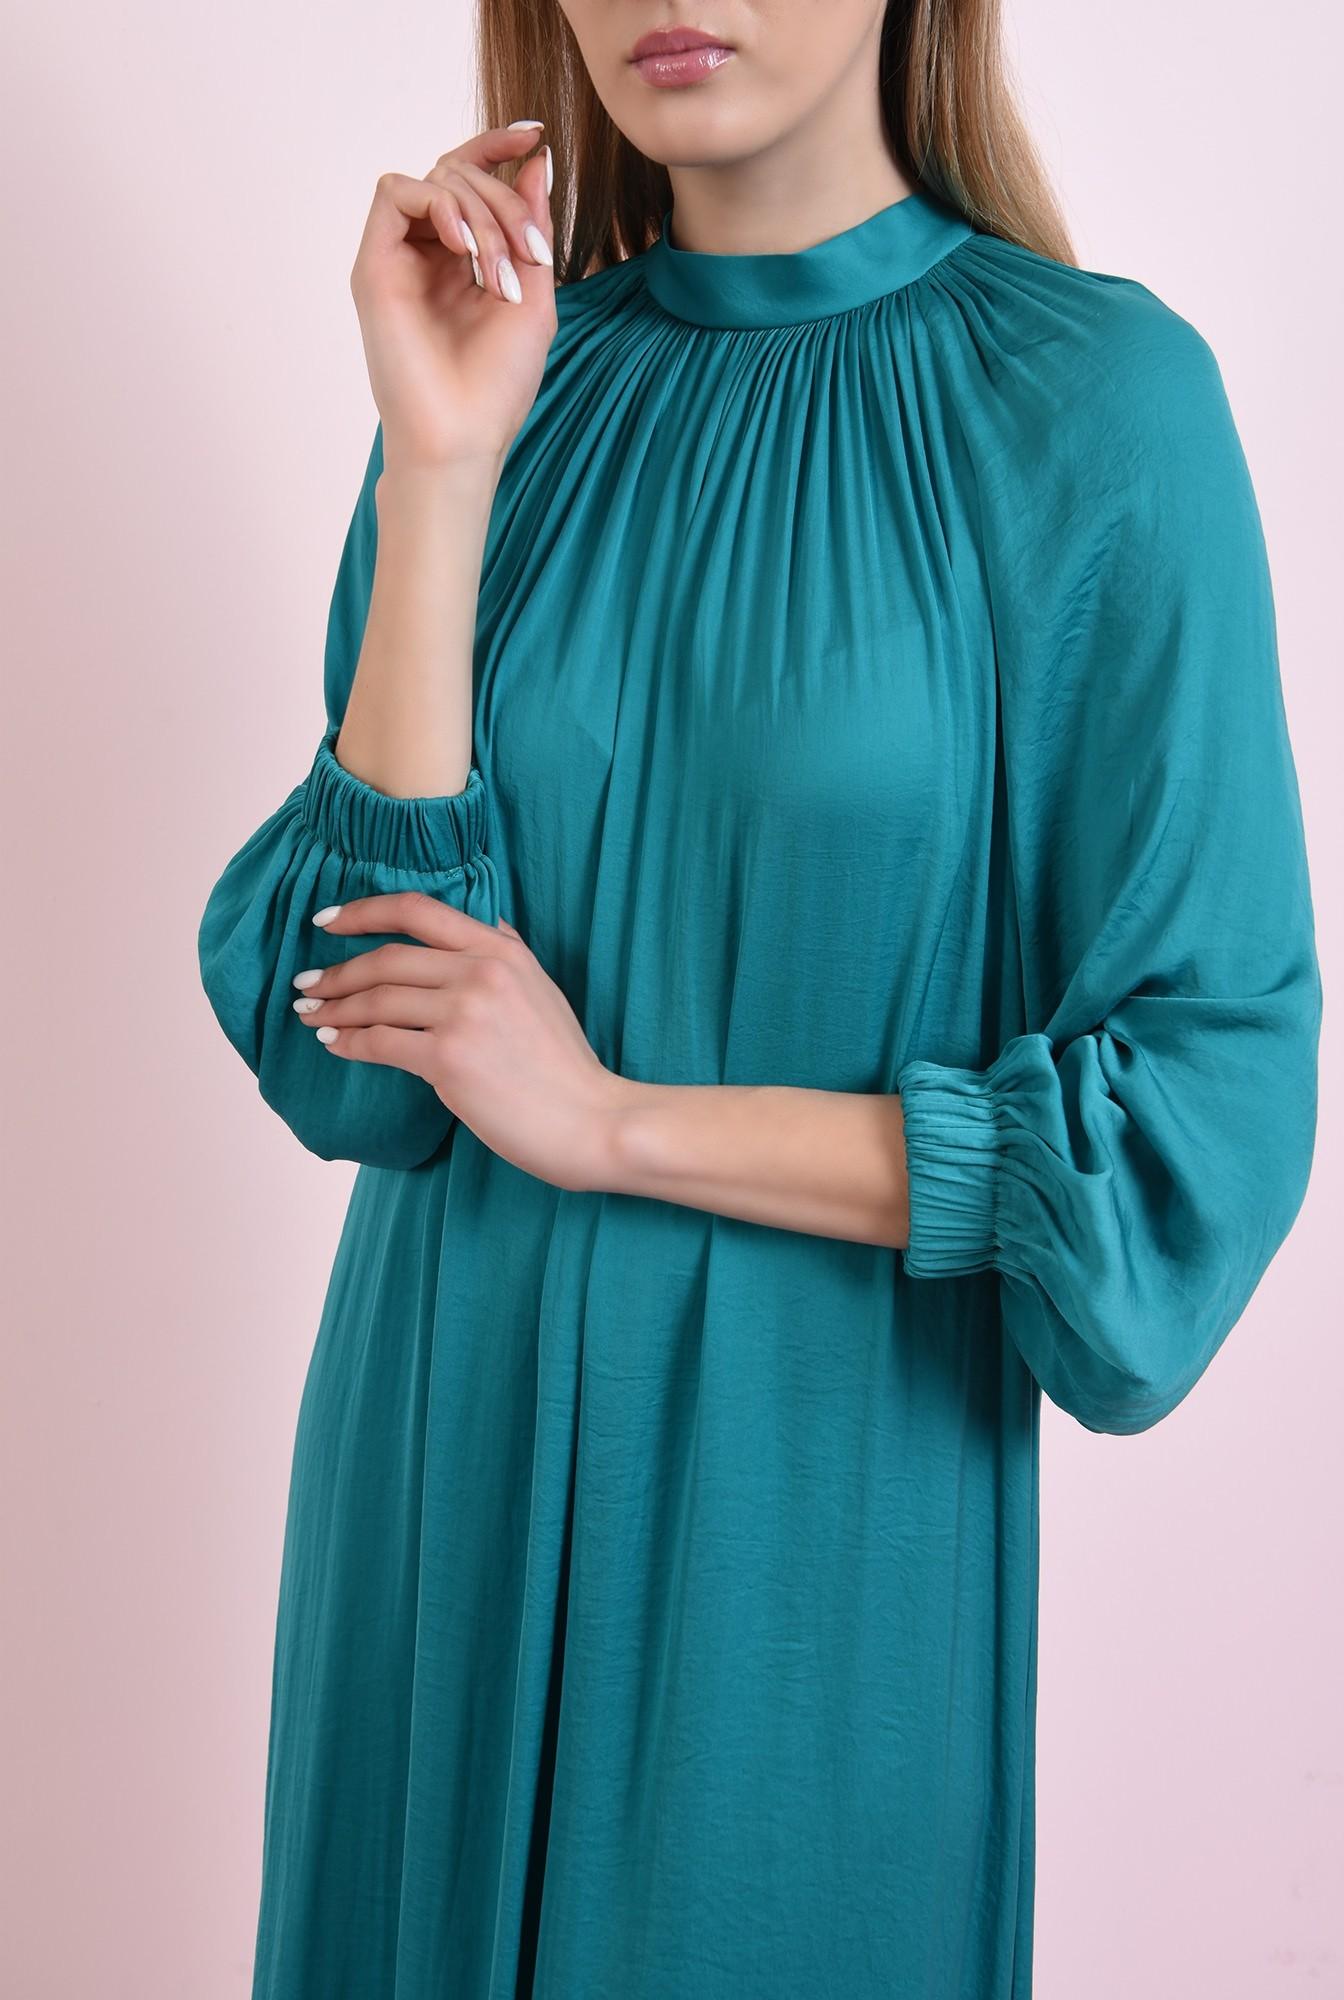 3 - 360 - rochie midi, verde, din satin